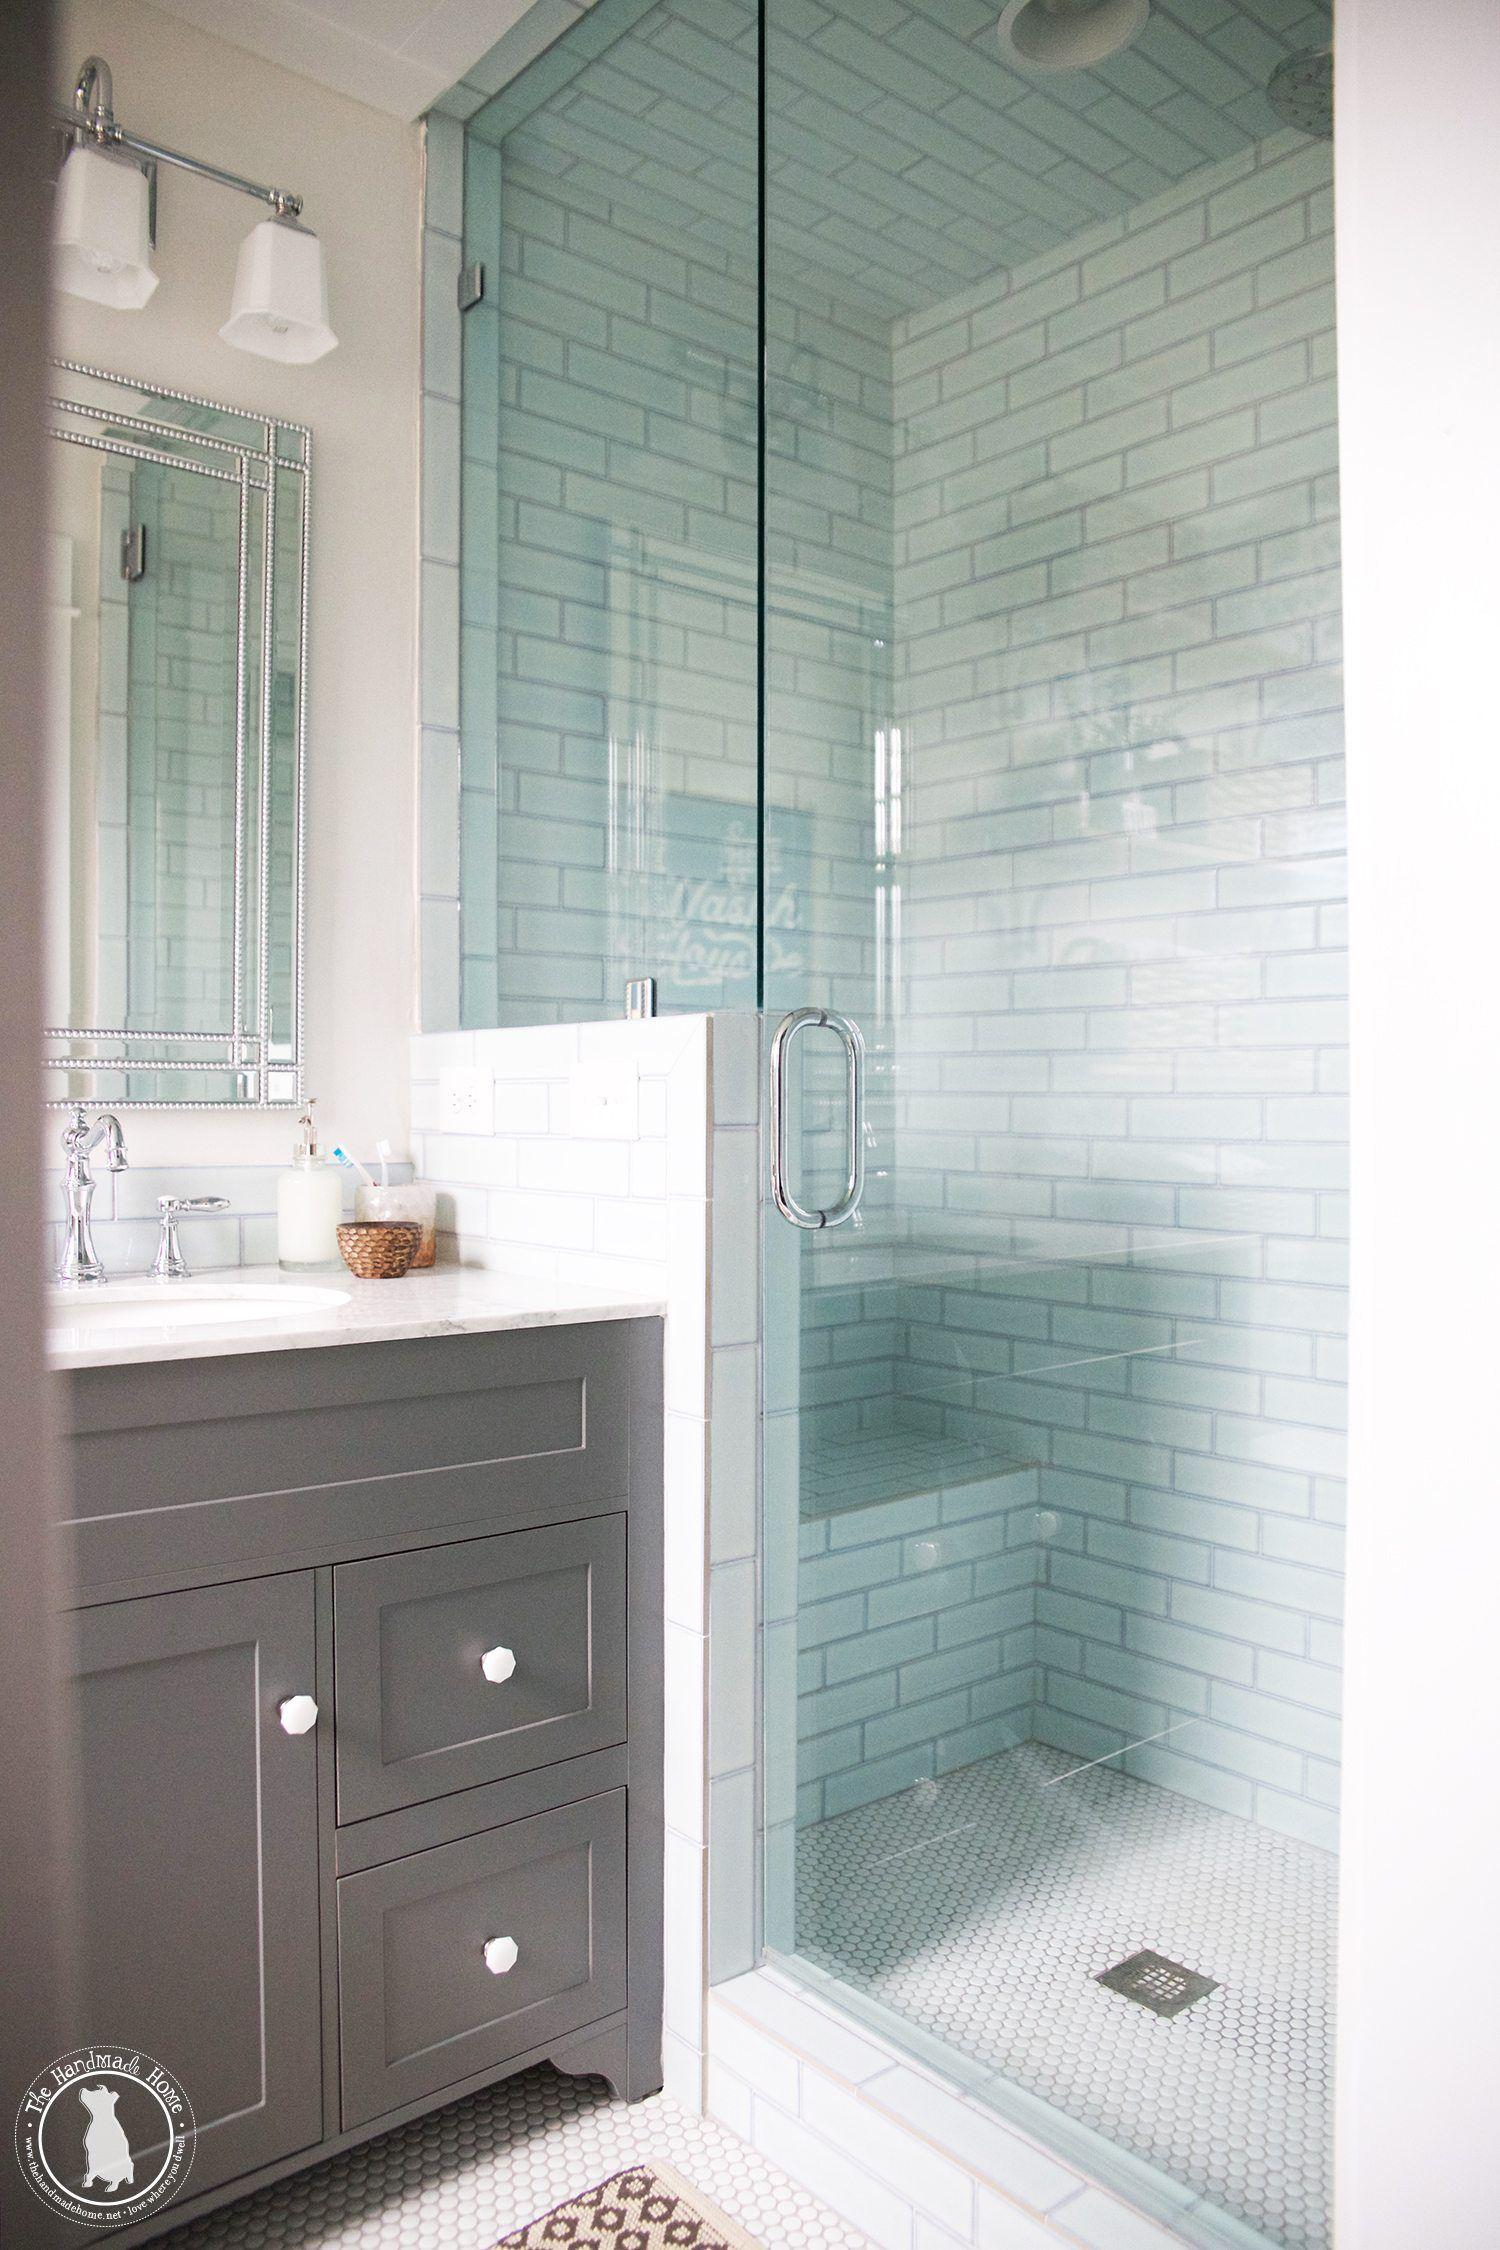 50 Inspiring Bathroom Updates | Pinterest | Master bathrooms, Tiny ...